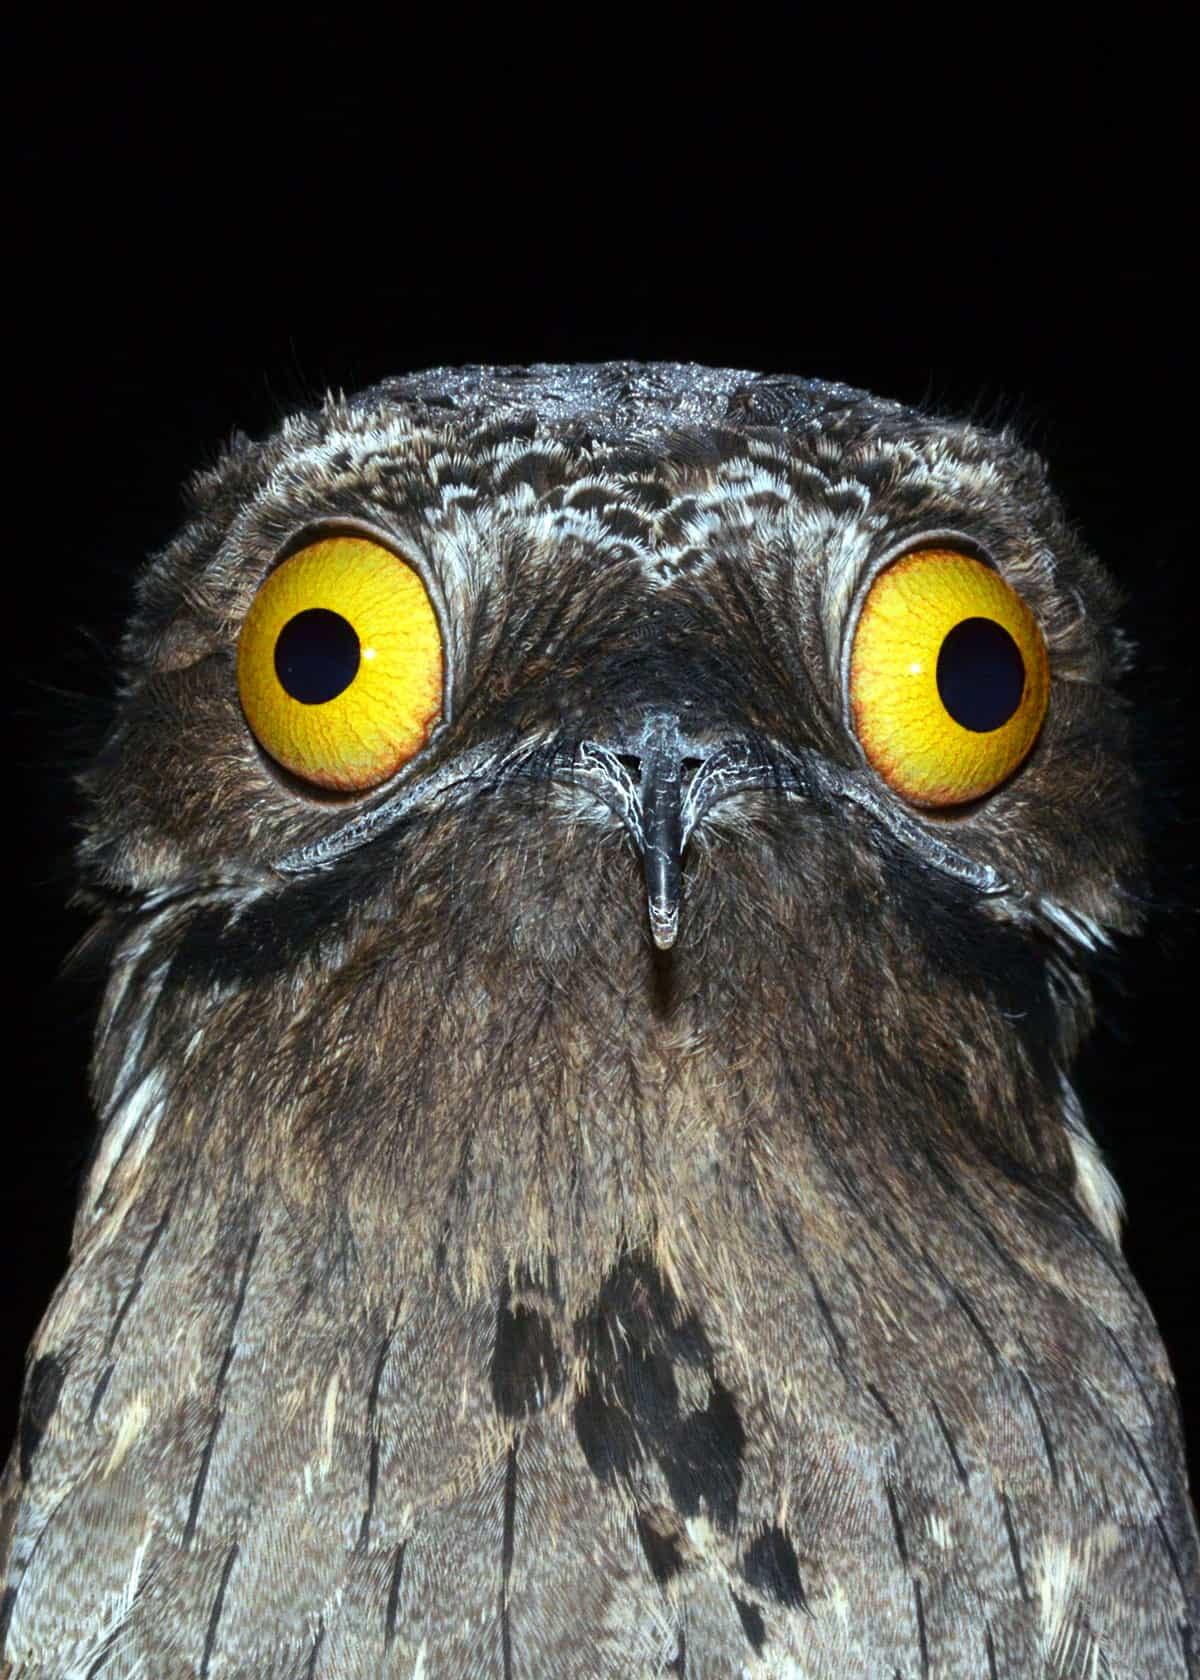 Panicked Screaming Bird Meme